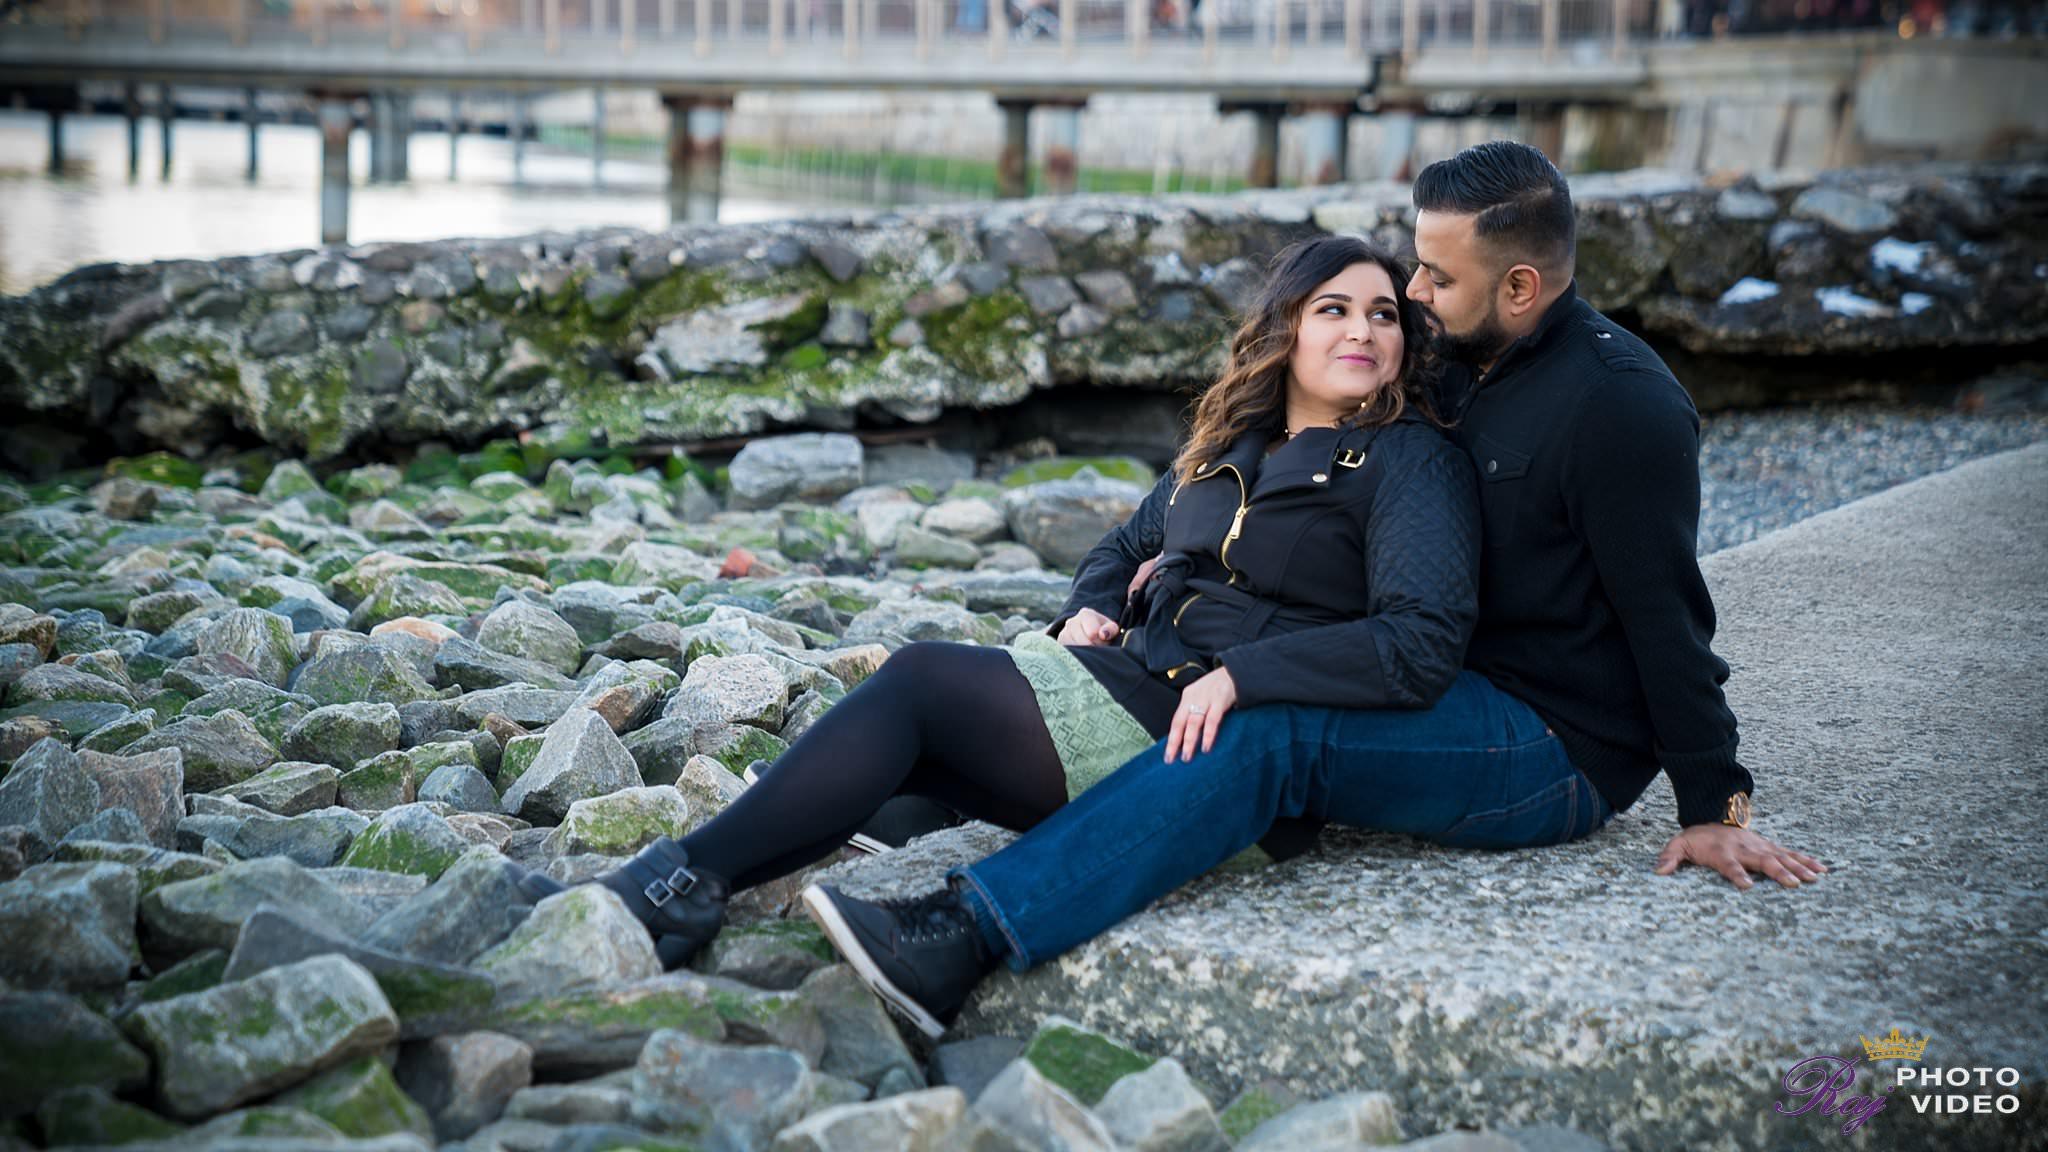 Hoboken-Pier-Engagement-Shoot-Zalak-Parag-00006_Raj_Photo_Video.jpg